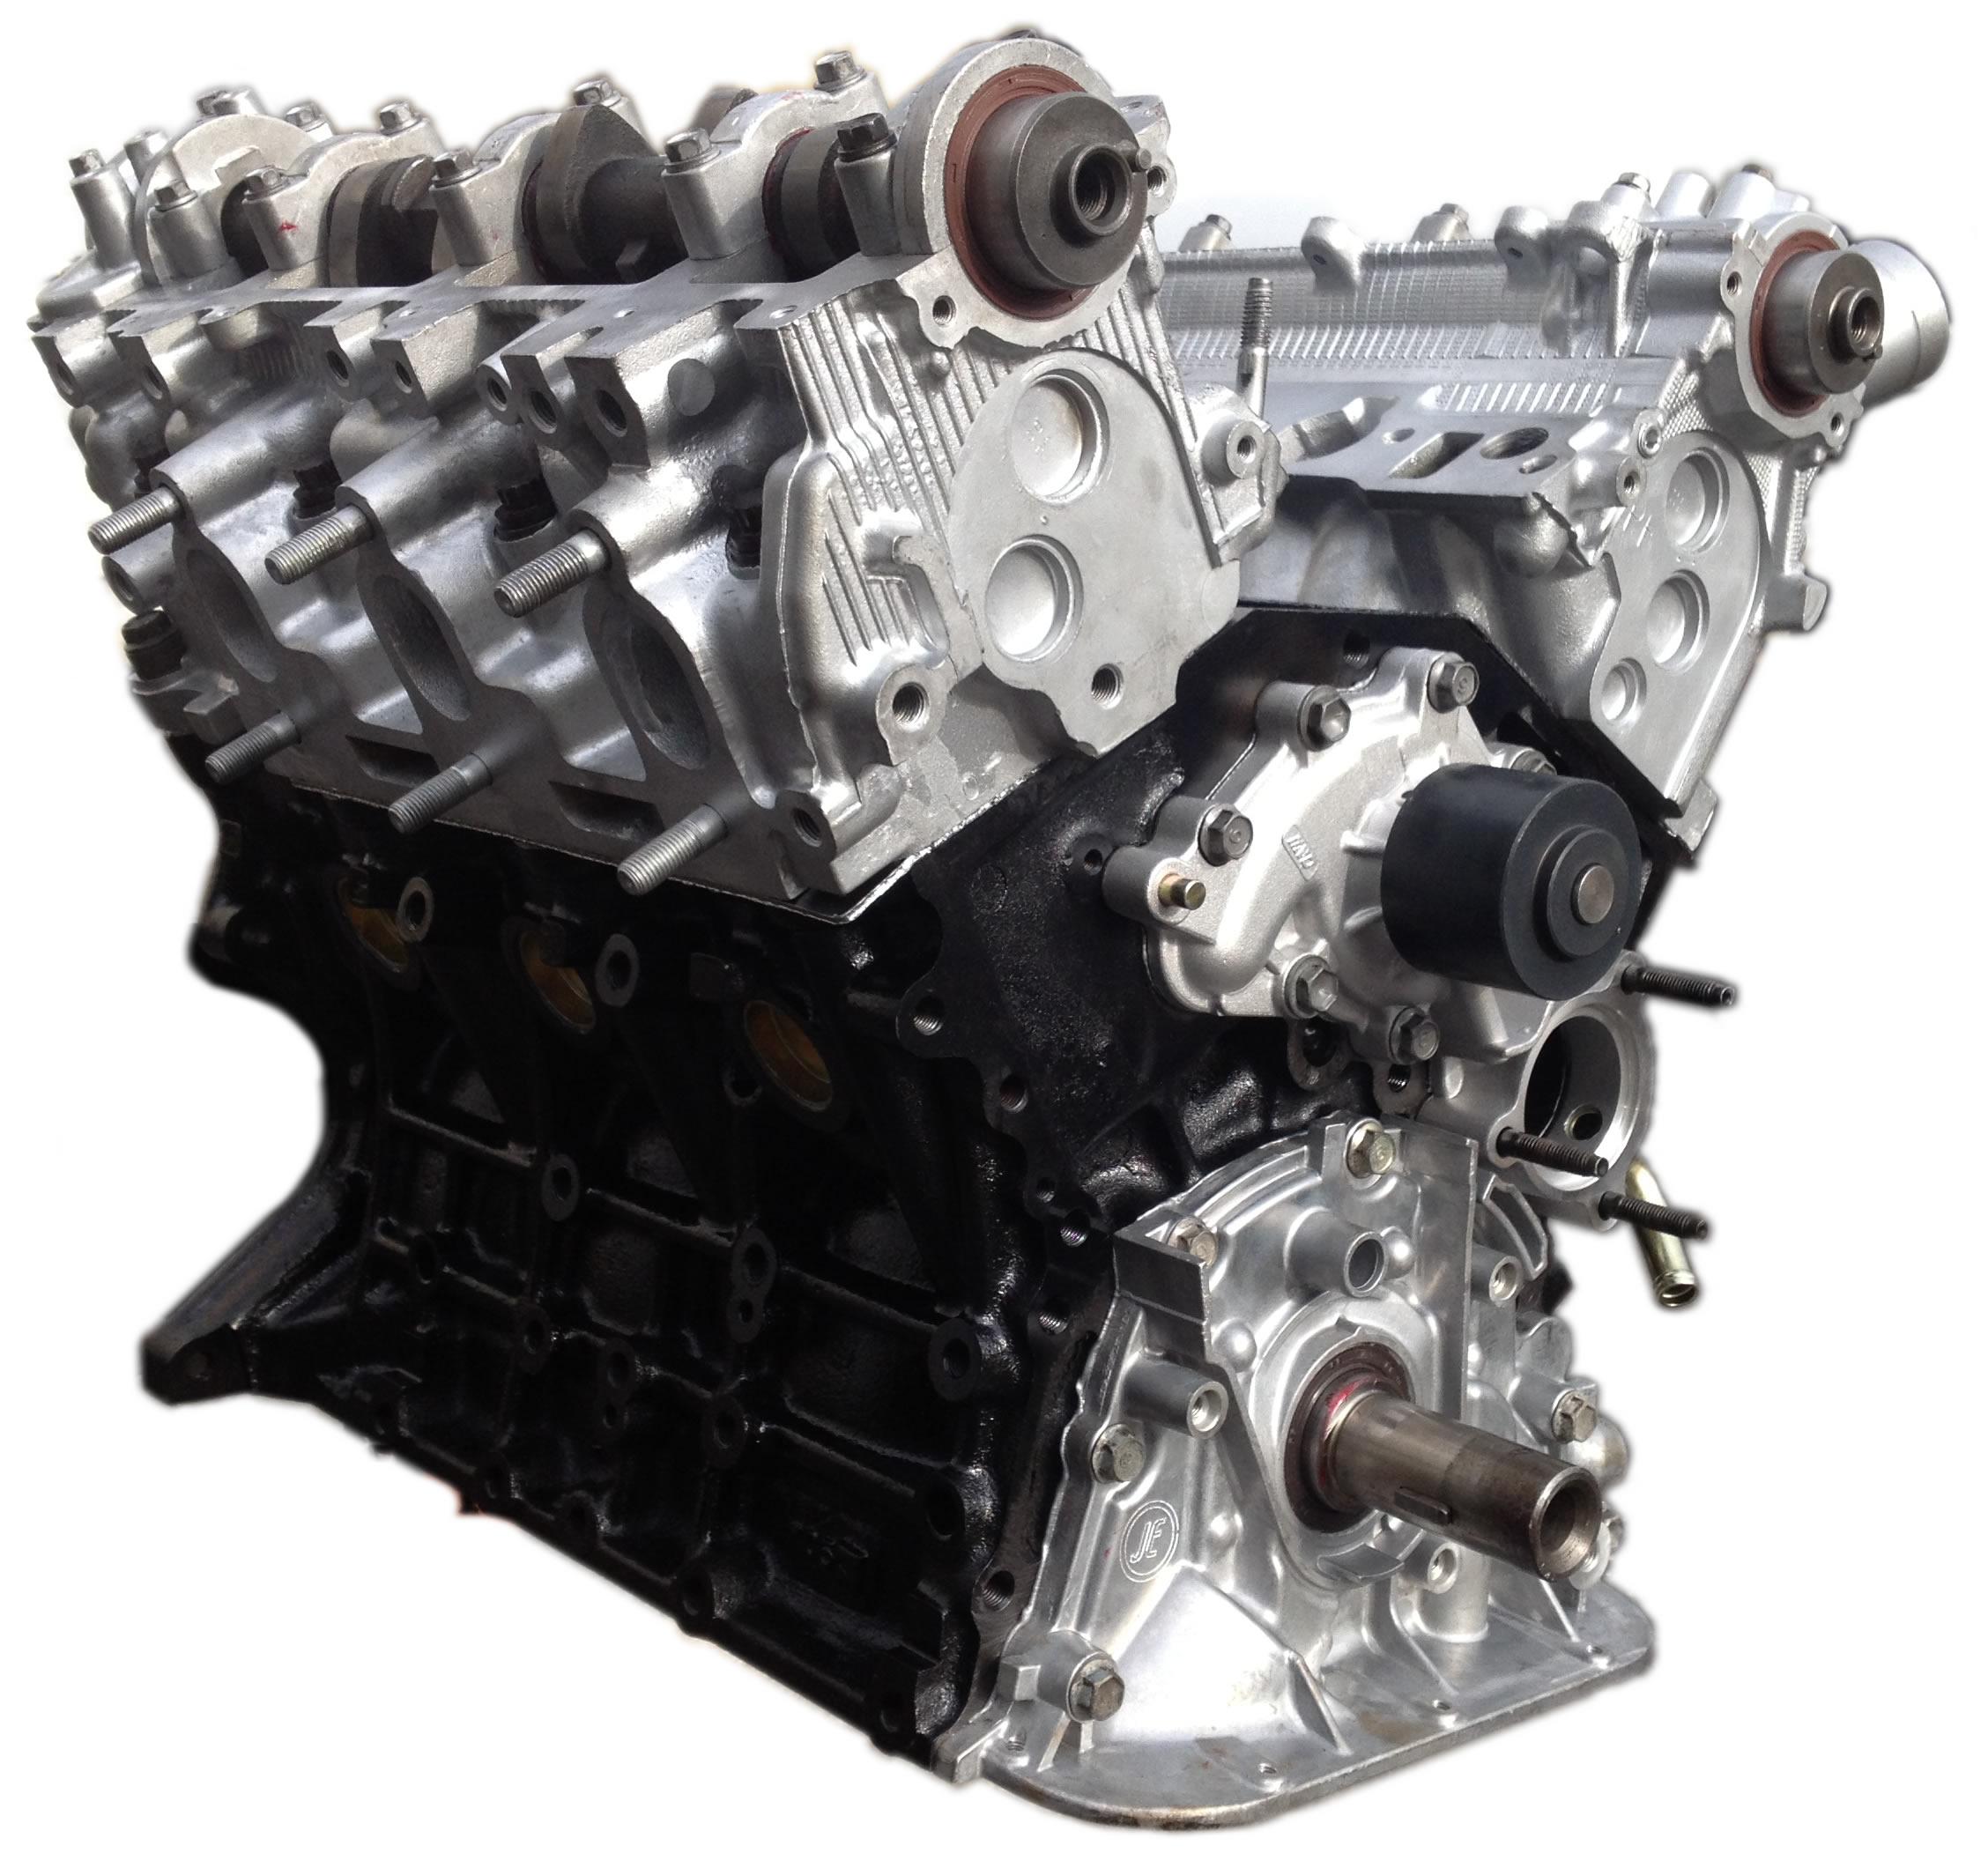 Rebuilt 93 94 Toyota T100 3 0l 3vze Engine Ebay